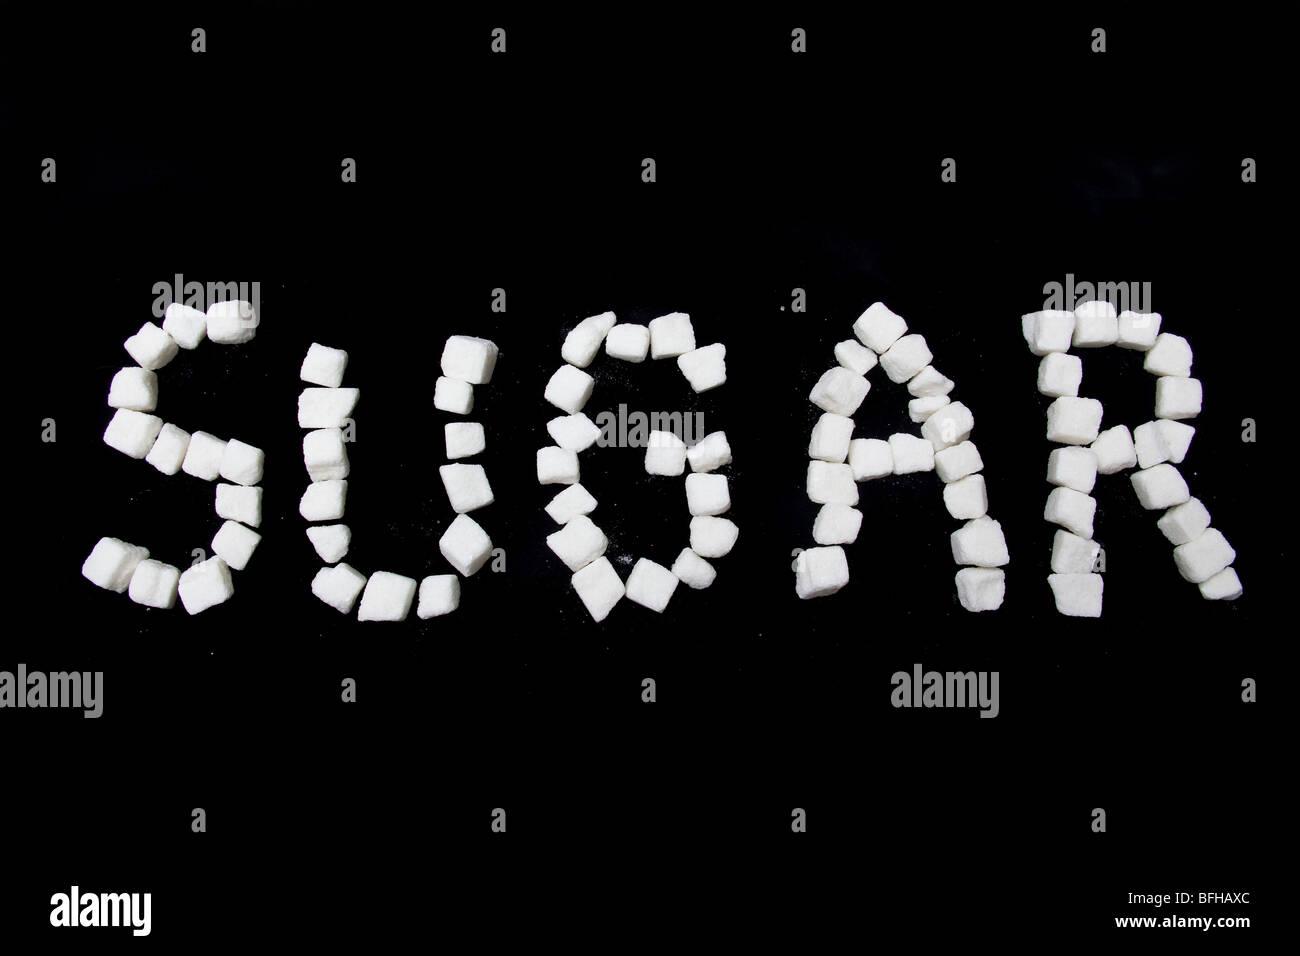 Sugar written in sugar lumps on a black studio background. - Stock Image